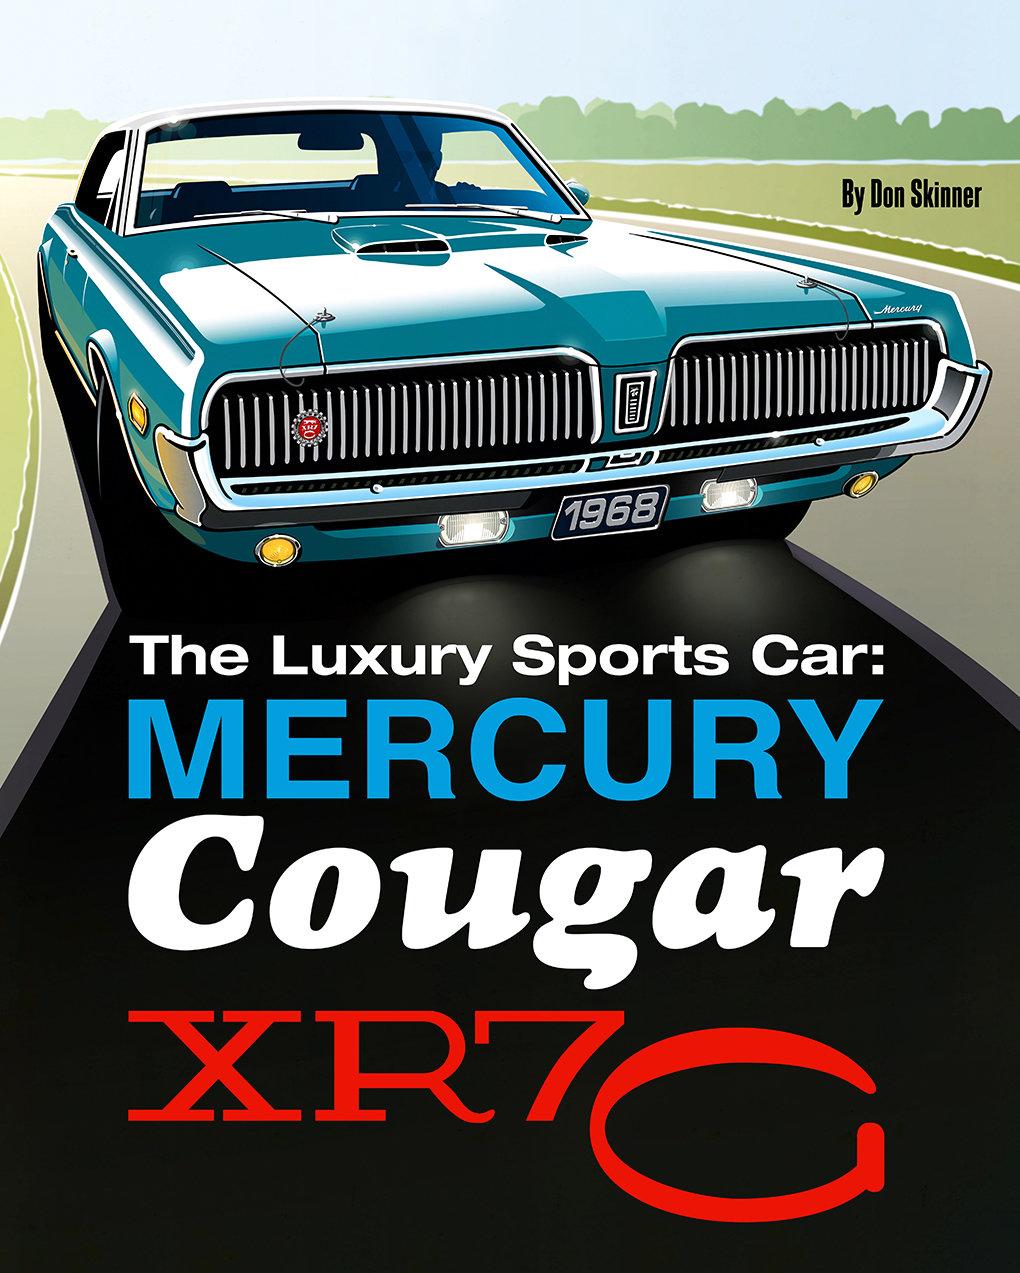 Mercury Cougar XR7-G Book